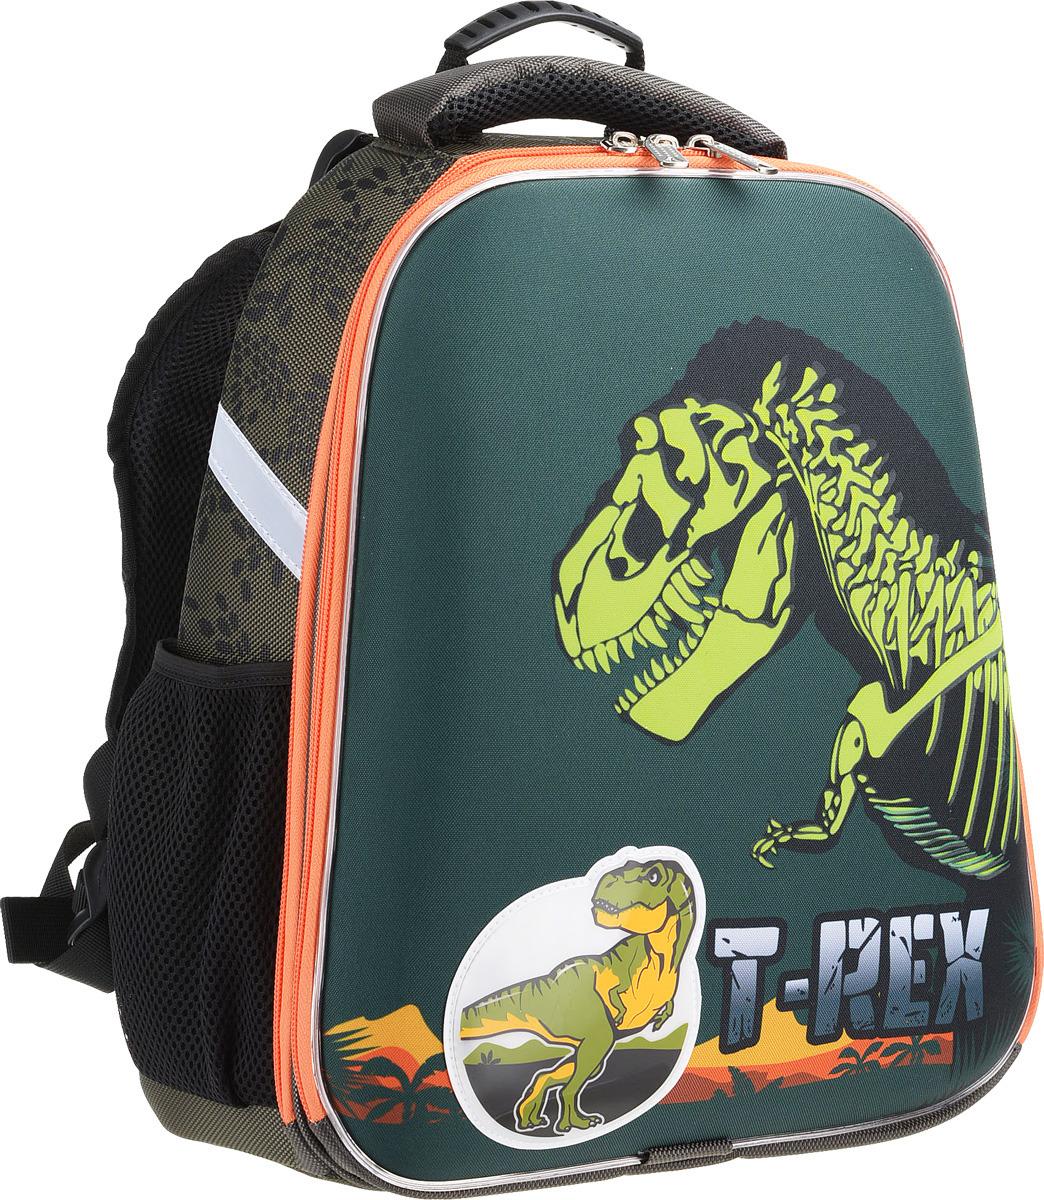 Картинки рюкзак динозавр